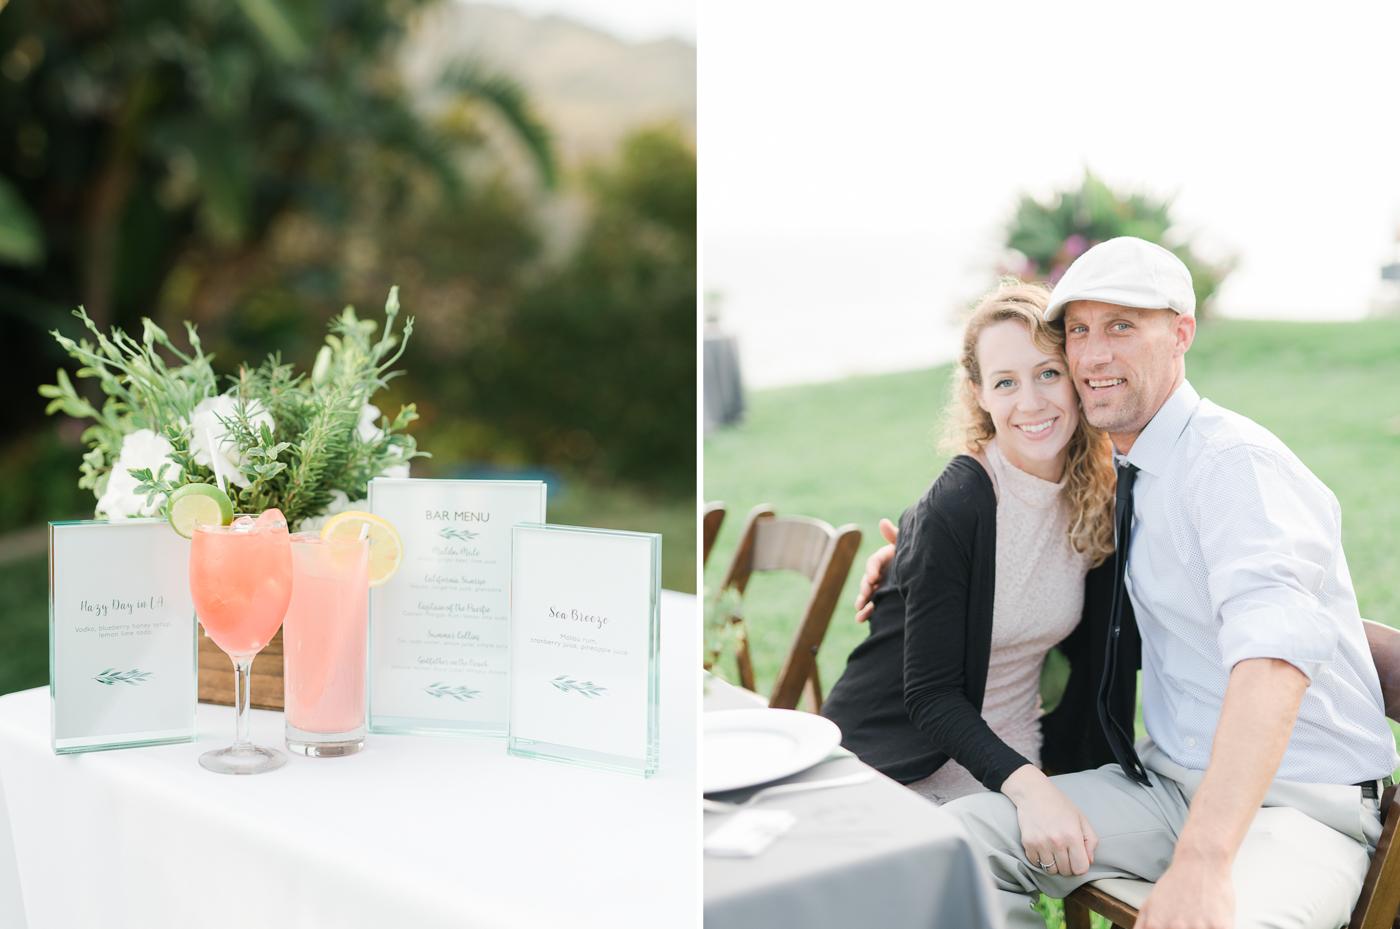 AKP_S&F_Malibu_Wedding_Fine_Art_Photography_Los_Angeles-24_cocktail_hour_drinks.jpg